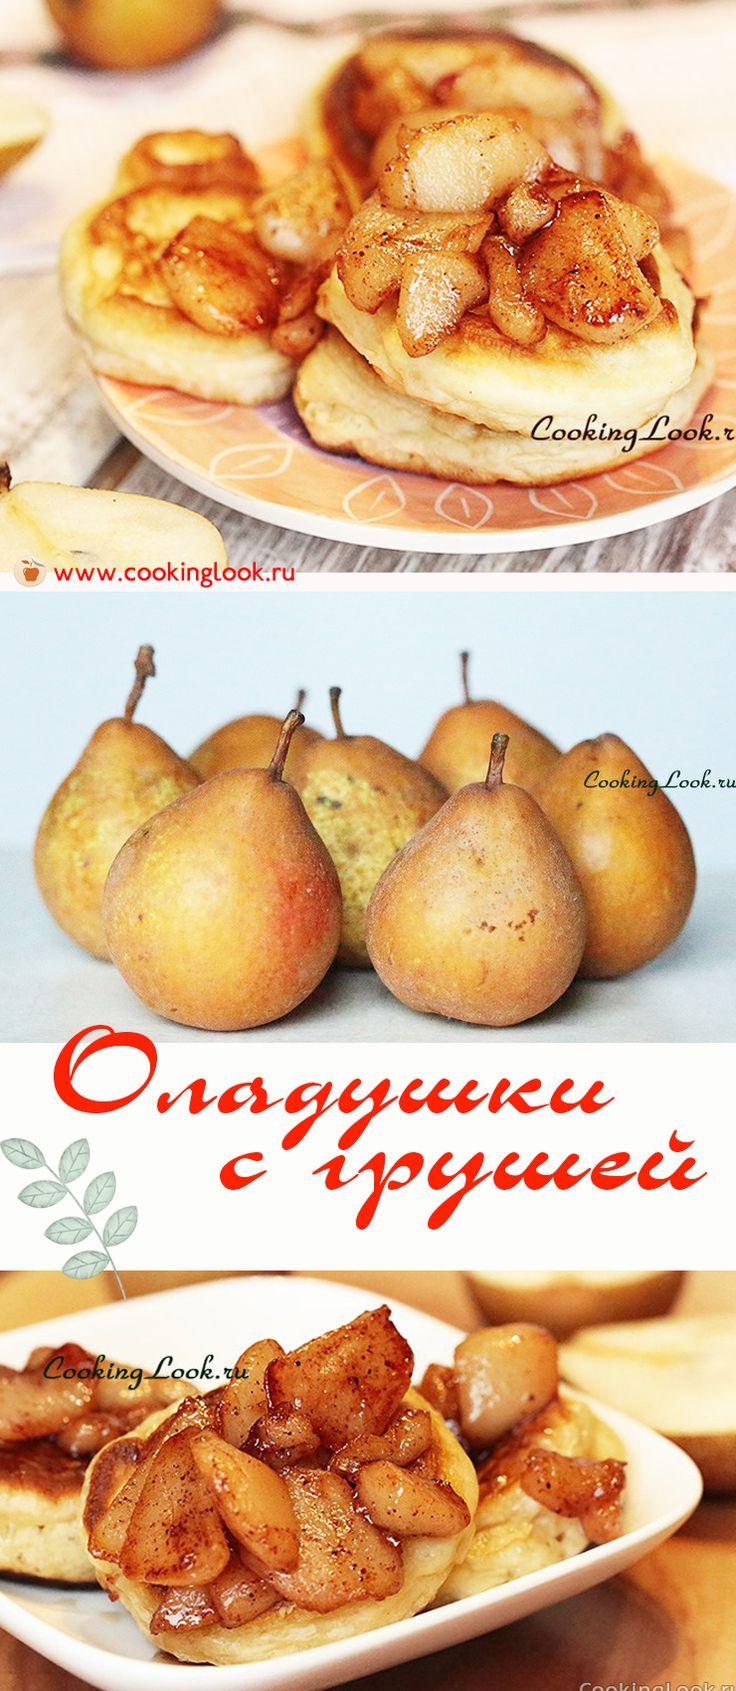 Pancakes, a recipe, a pear, cinnamon, lush, kefir.  Оладушки, рецепт, груша, корица, пышные, на кефире.  Больше подробностей с сайта http://cookinglook.ru